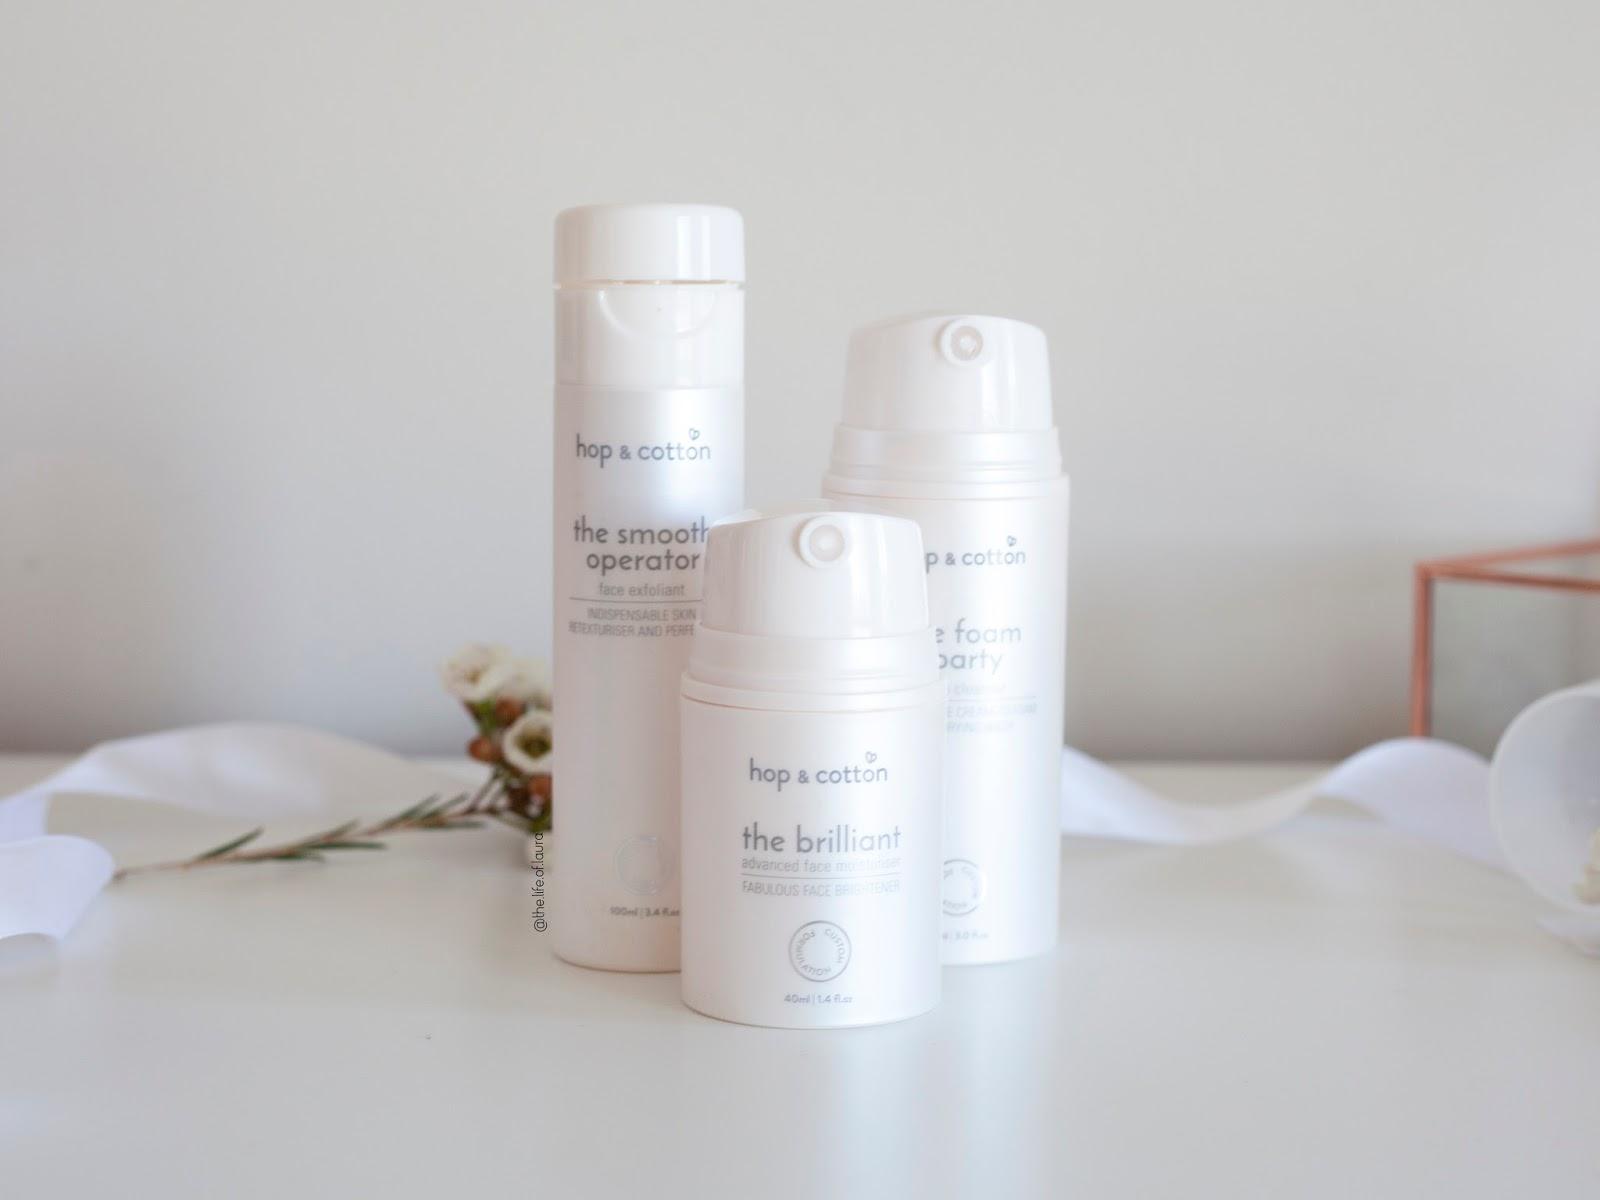 Hop & Cotton Customised Skincare